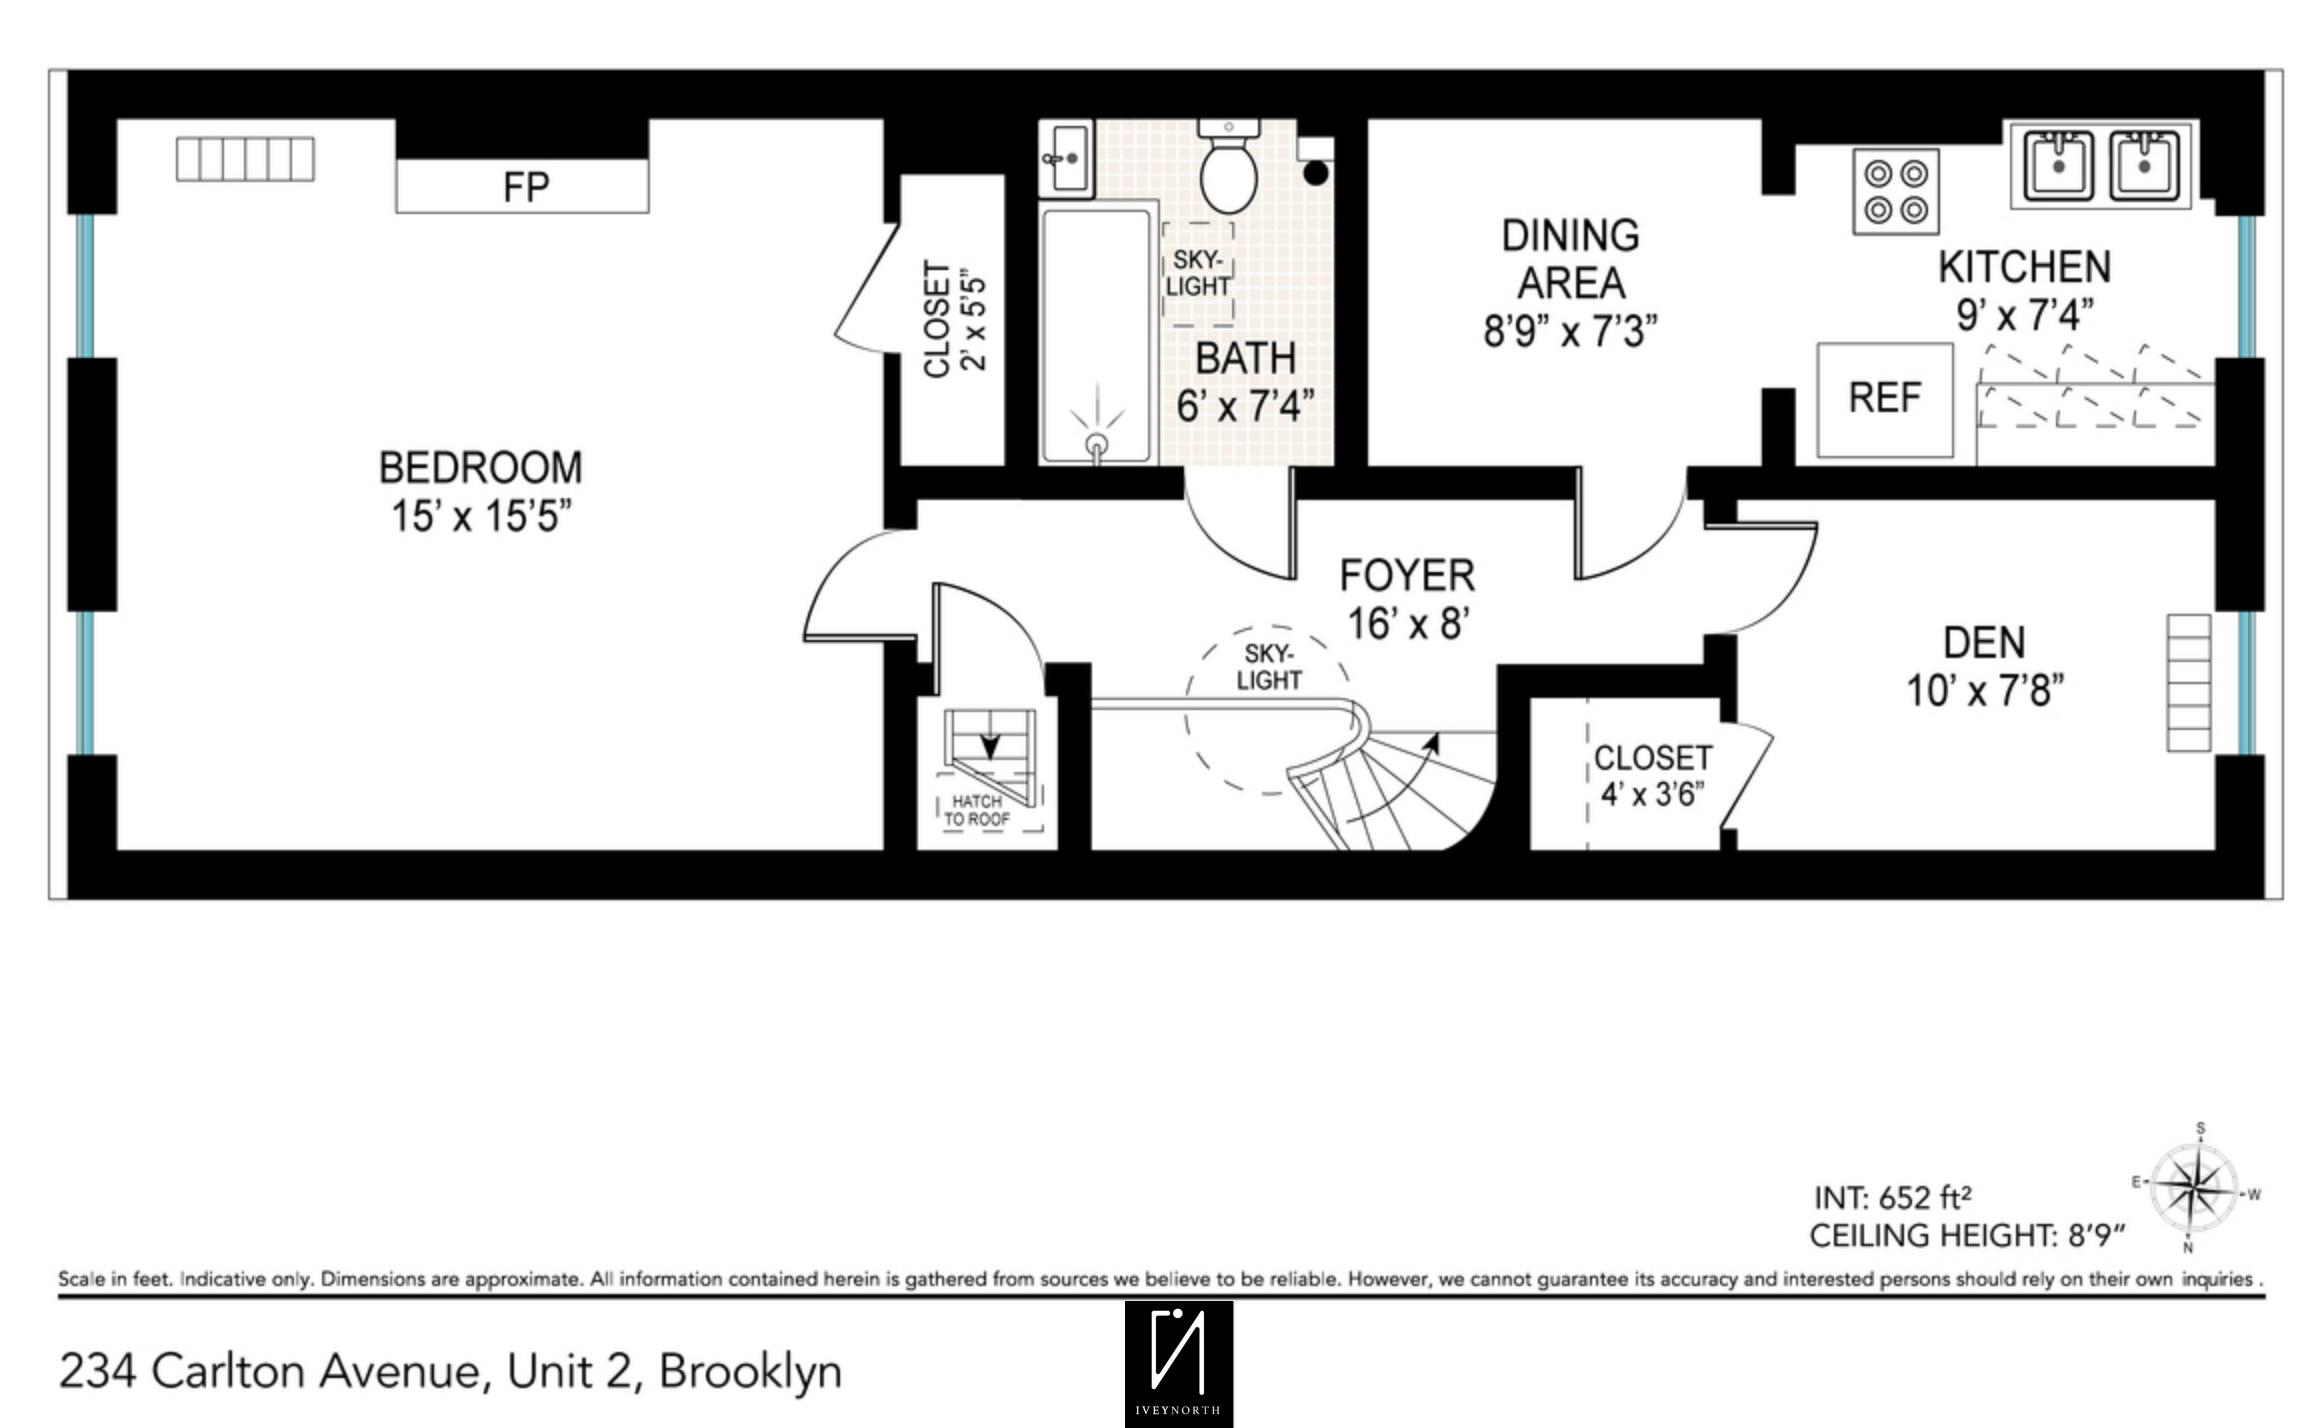 234 Carlton Avenue Unit 2 Floorplan.png